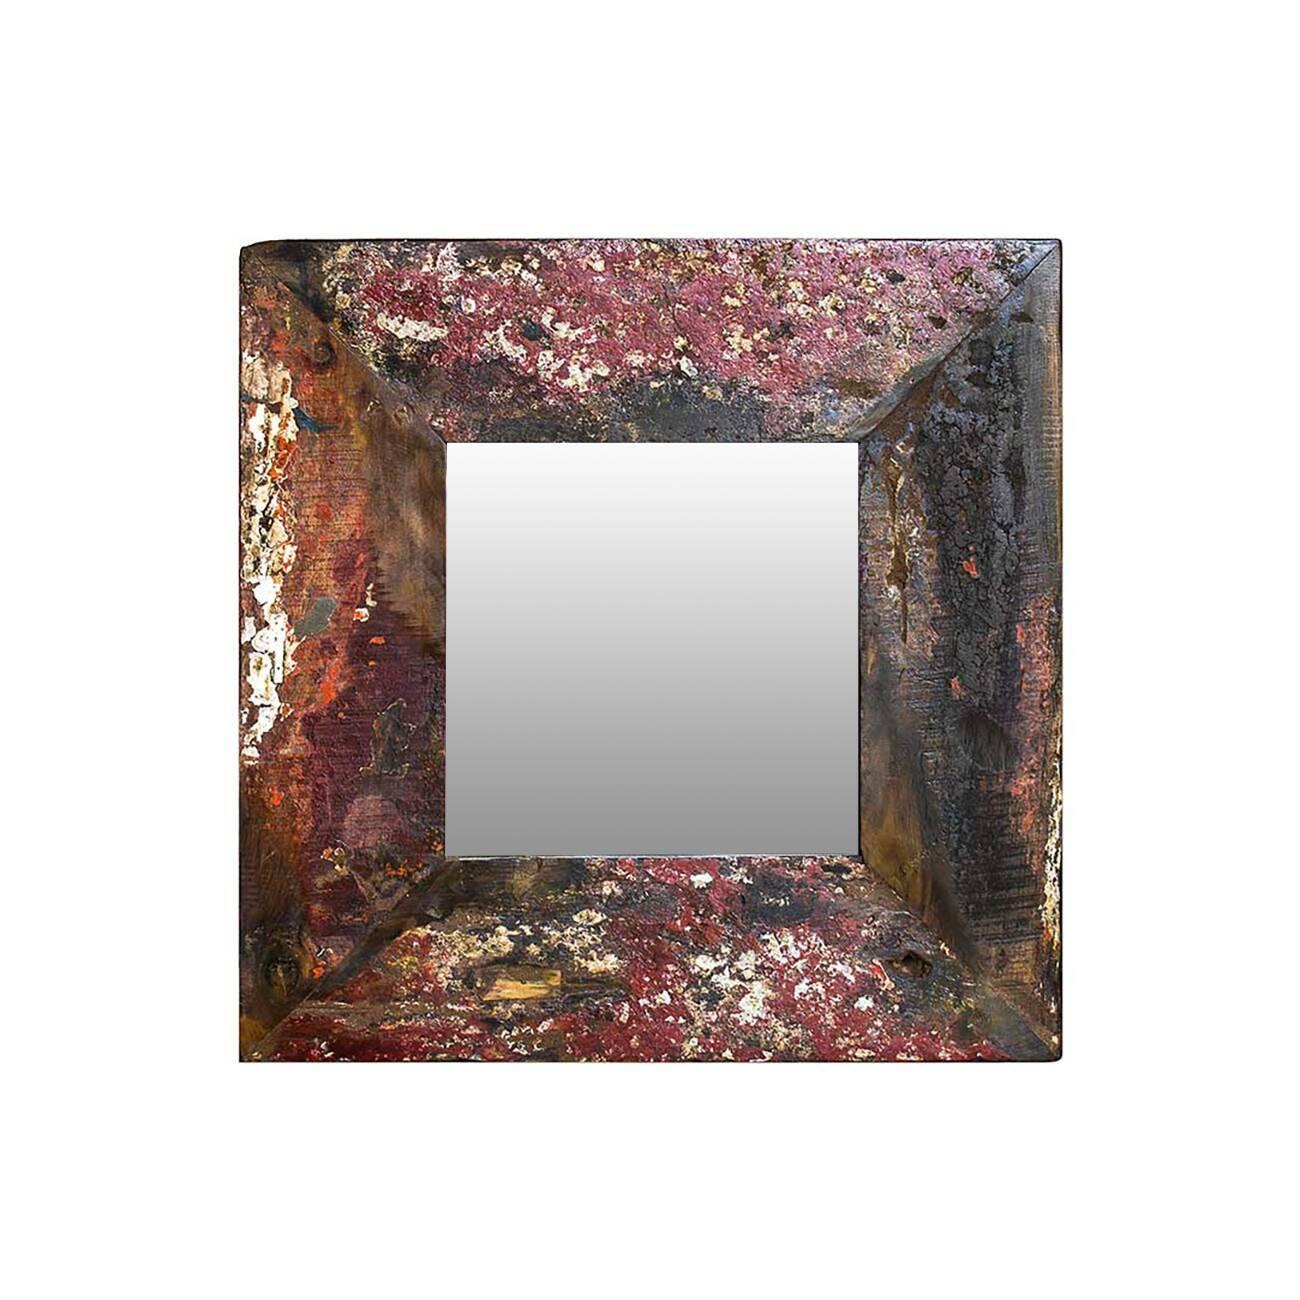 Зеркало Like Lodka 15576253 от Cosmorelax